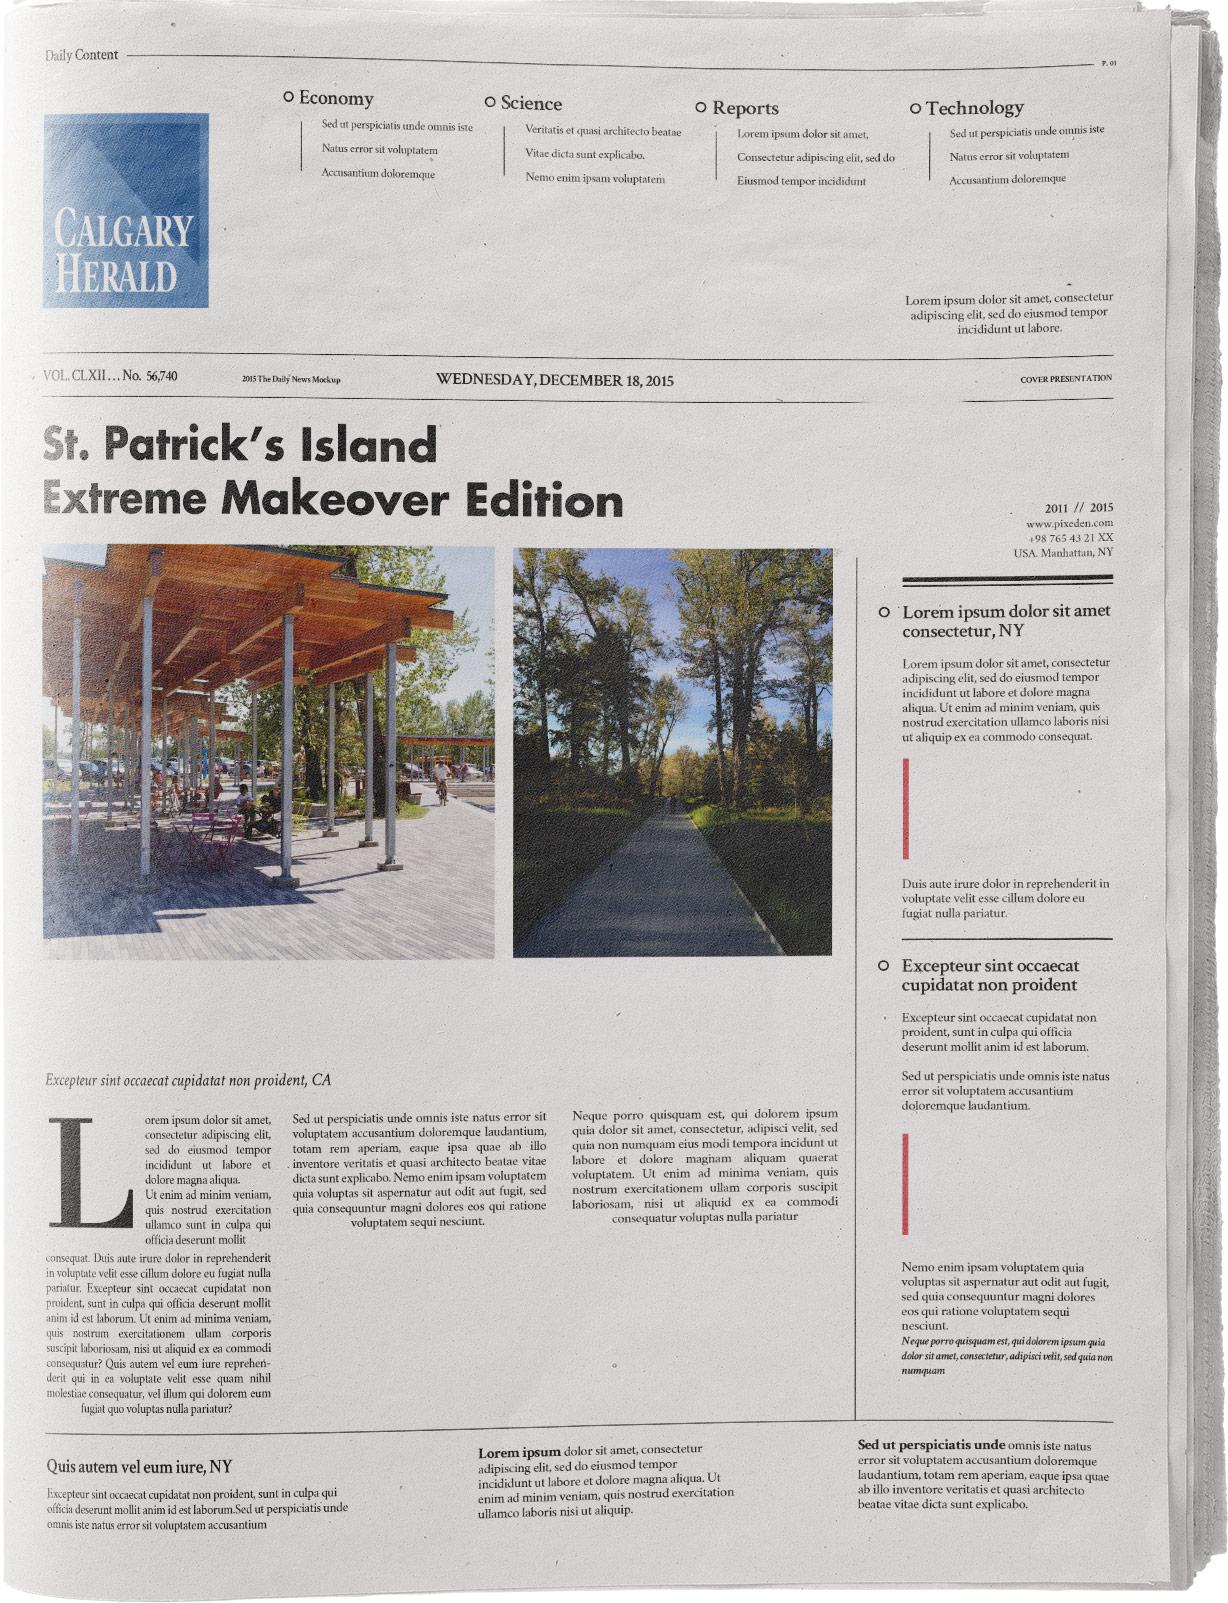 "Mcmurray, Jenna. ""St. Patrick's Island Extreme Makeover Edition"" Calgary Herald, 3, April 26, 2012."